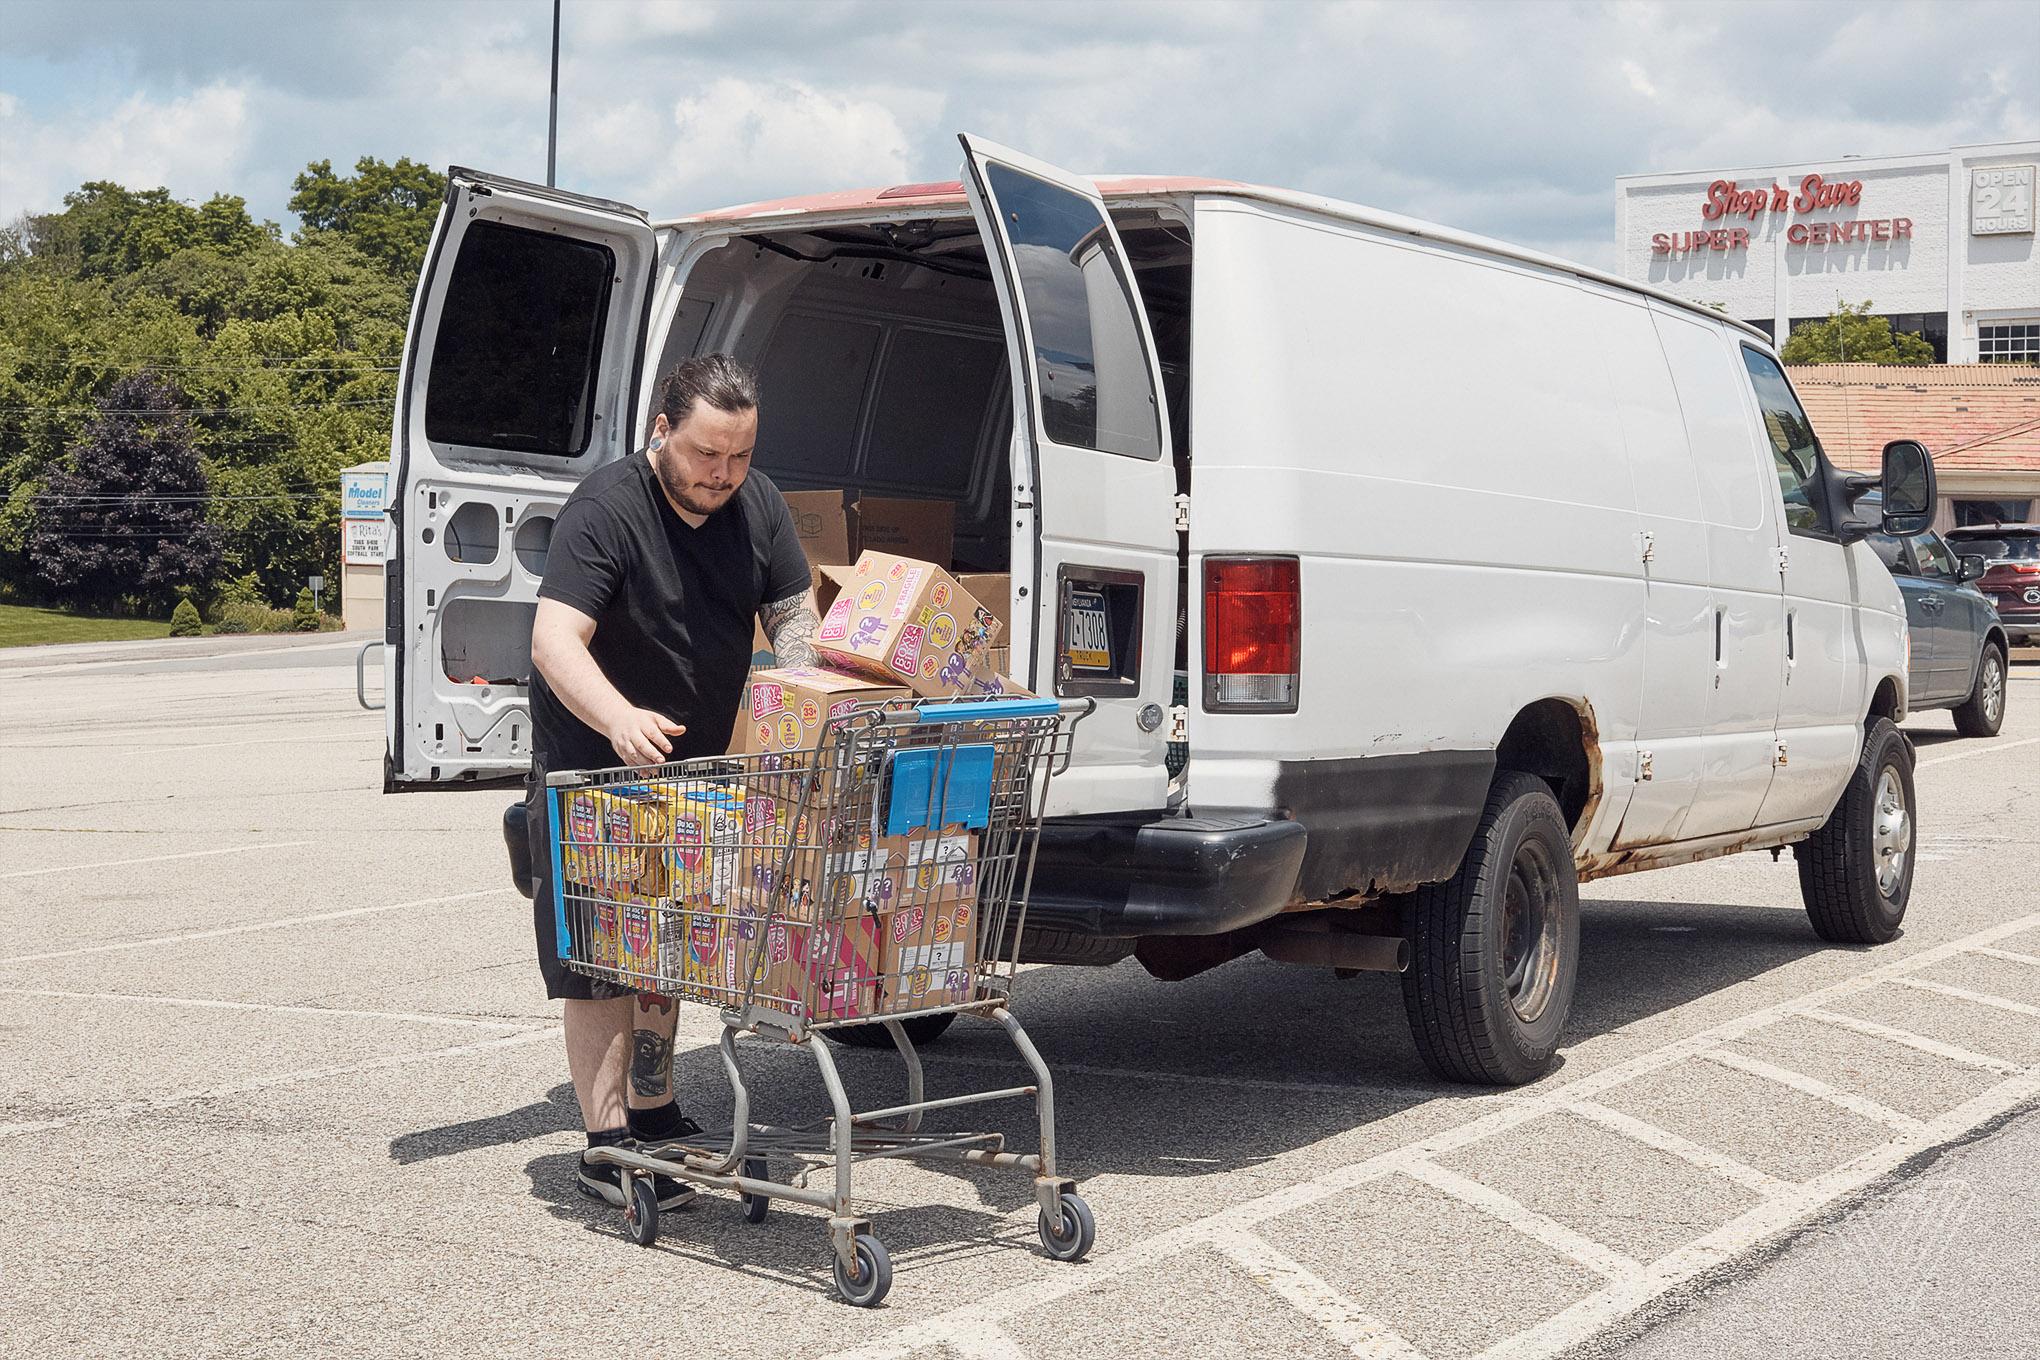 Nomads travel to America's Walmarts to stock Amazon's